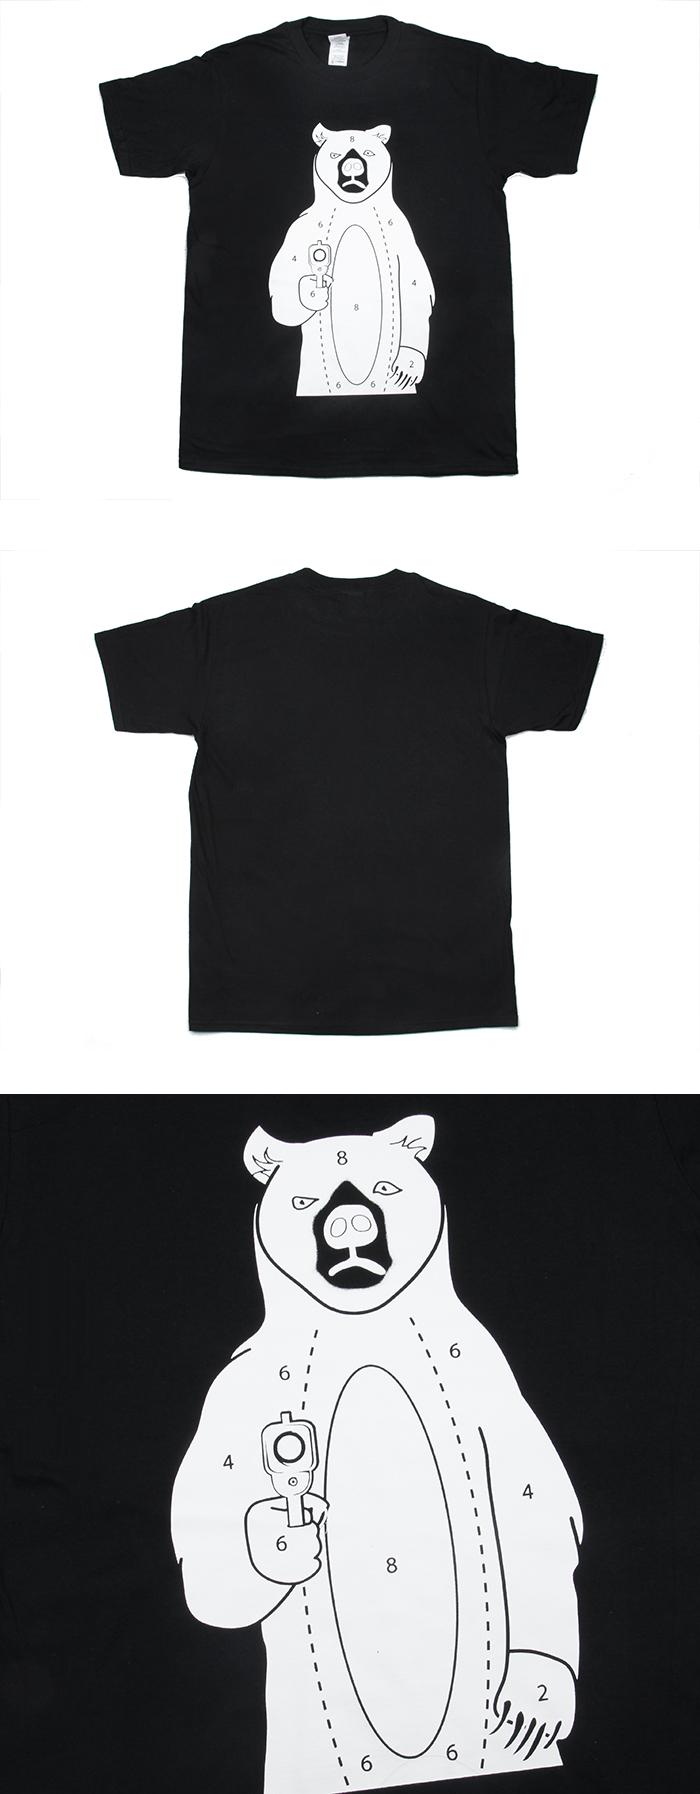 Black t shirt target - Tmc Gilden T Shirt Target Bear Bk